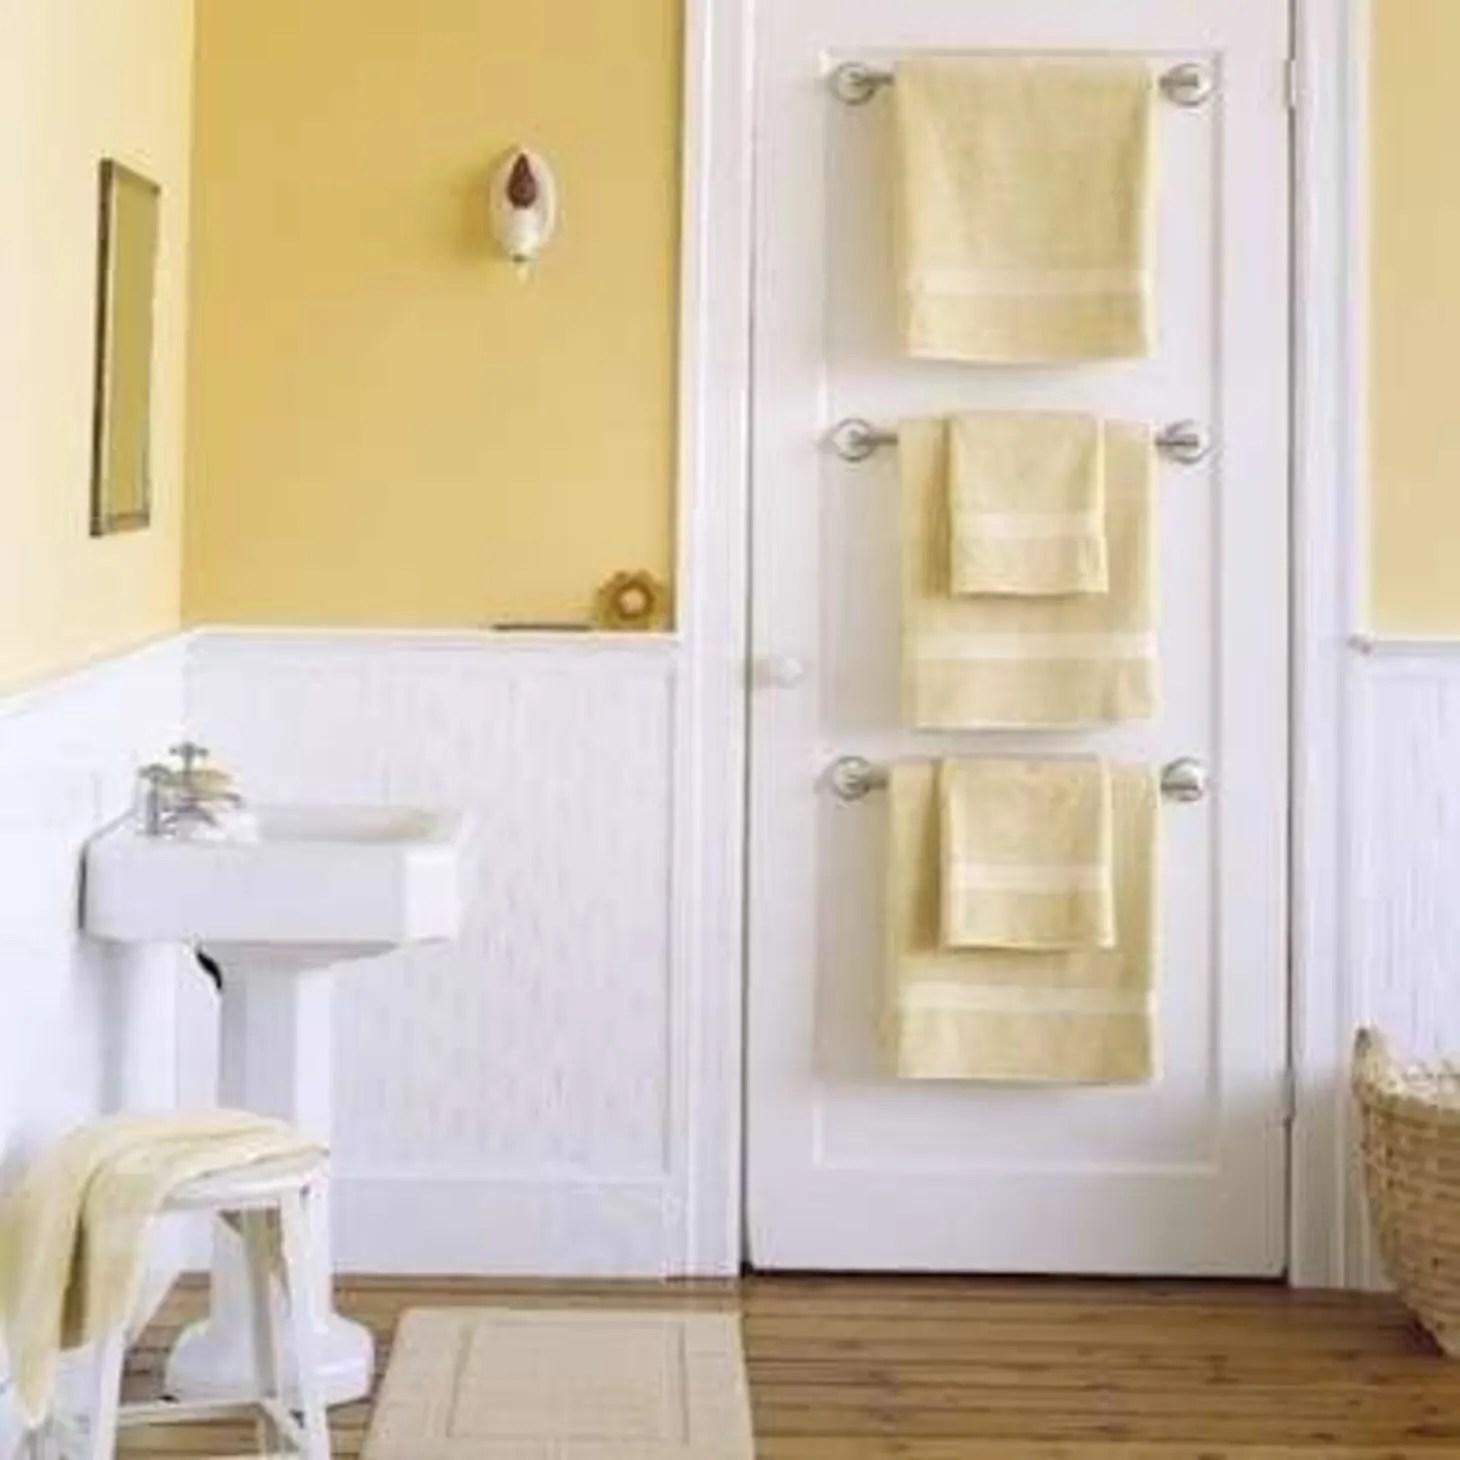 Bathroom Storage Ideas - Storage For Small Bathrooms ... on Small Apartment Bathroom Storage Ideas  id=56075